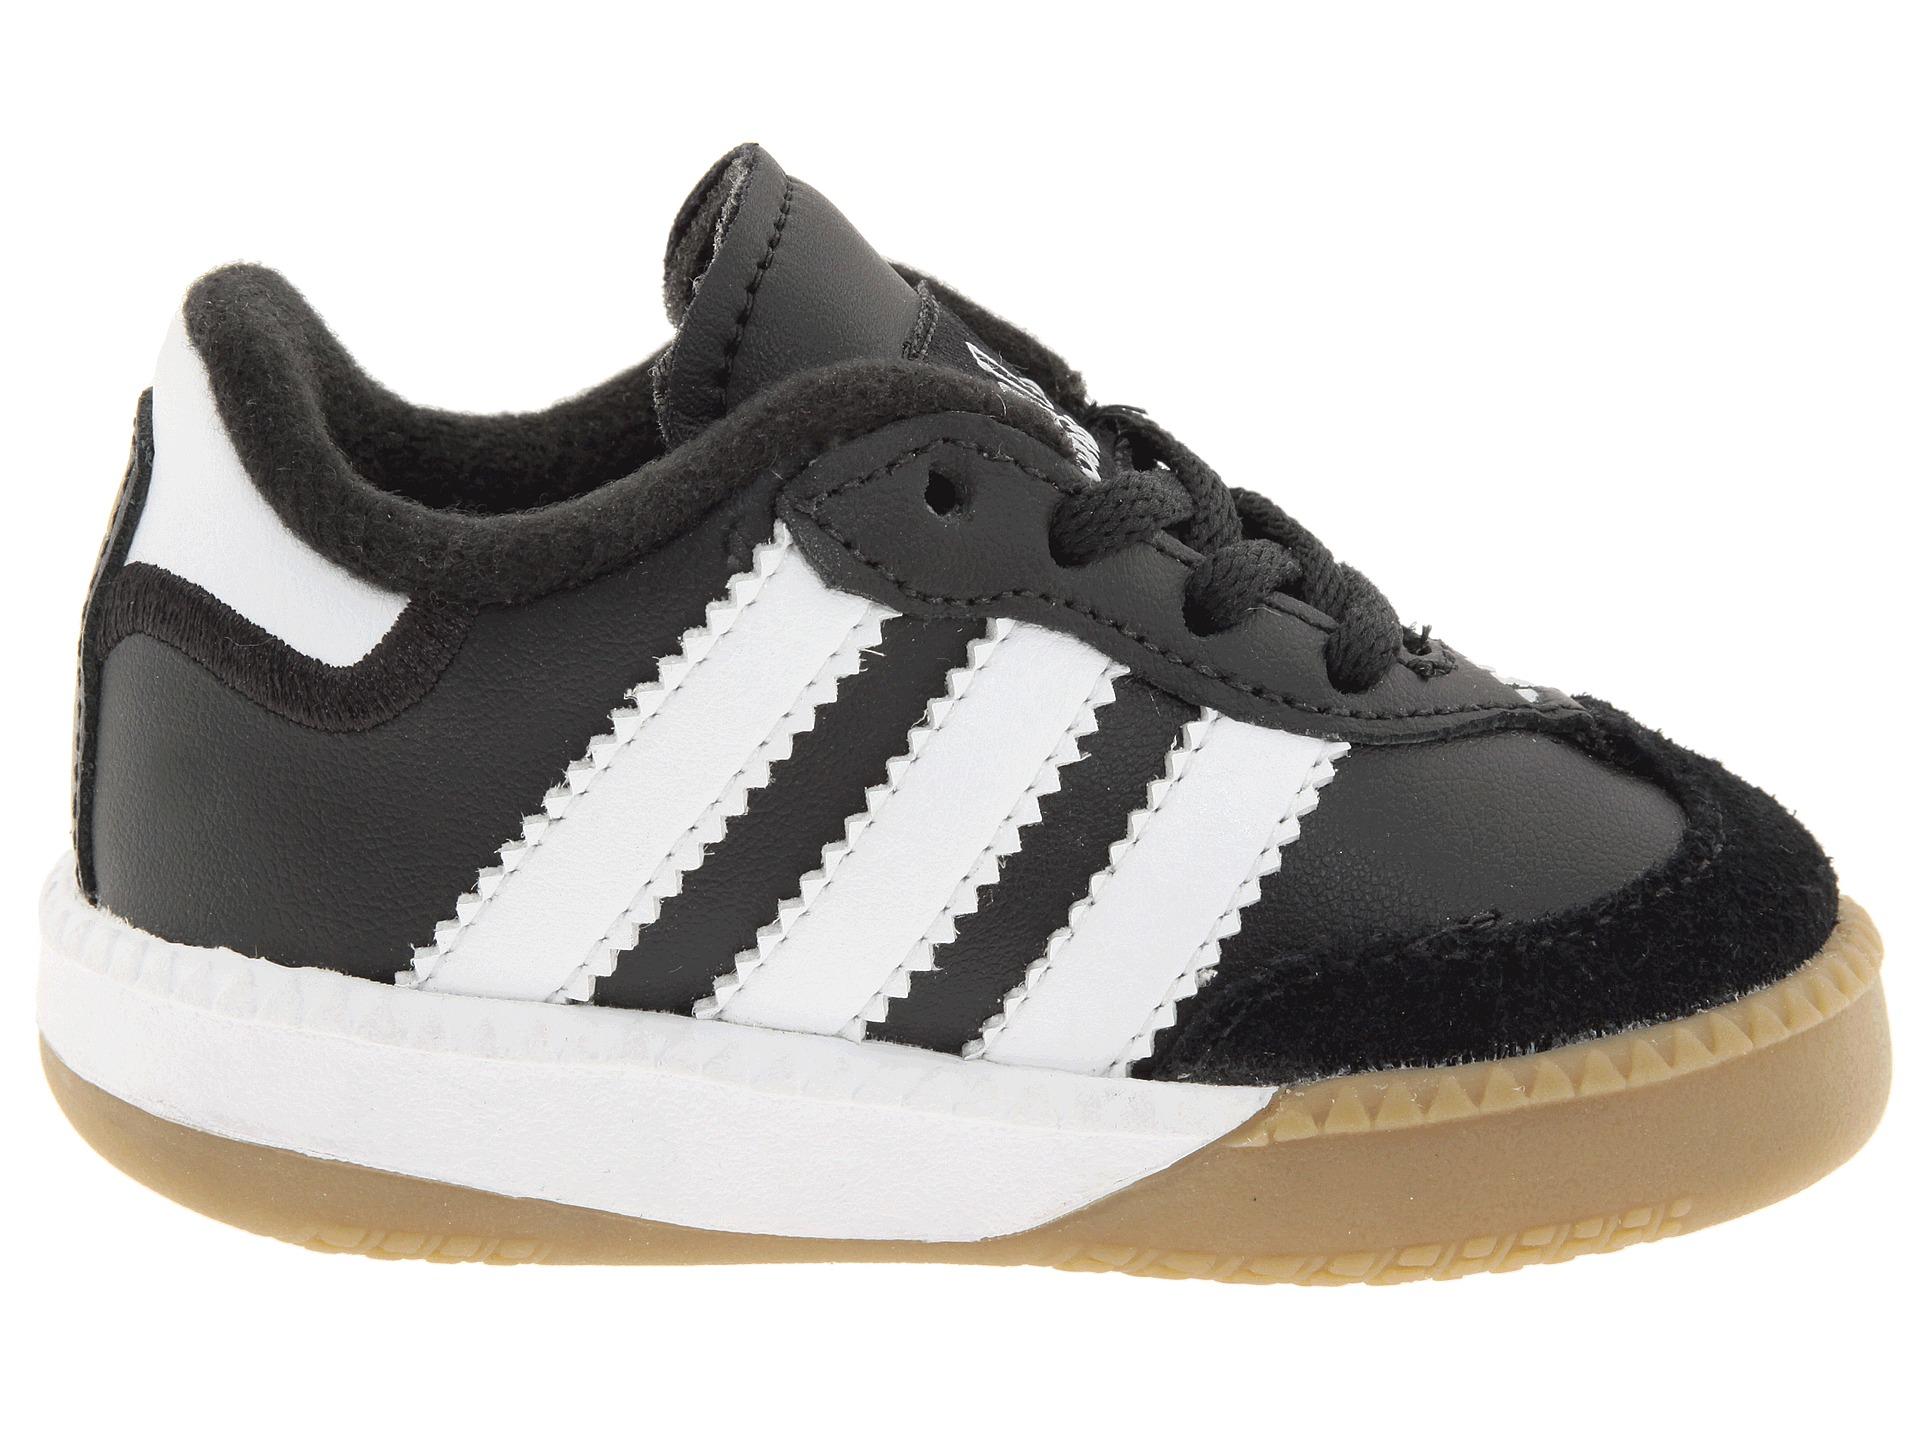 adidas samba boys size 5